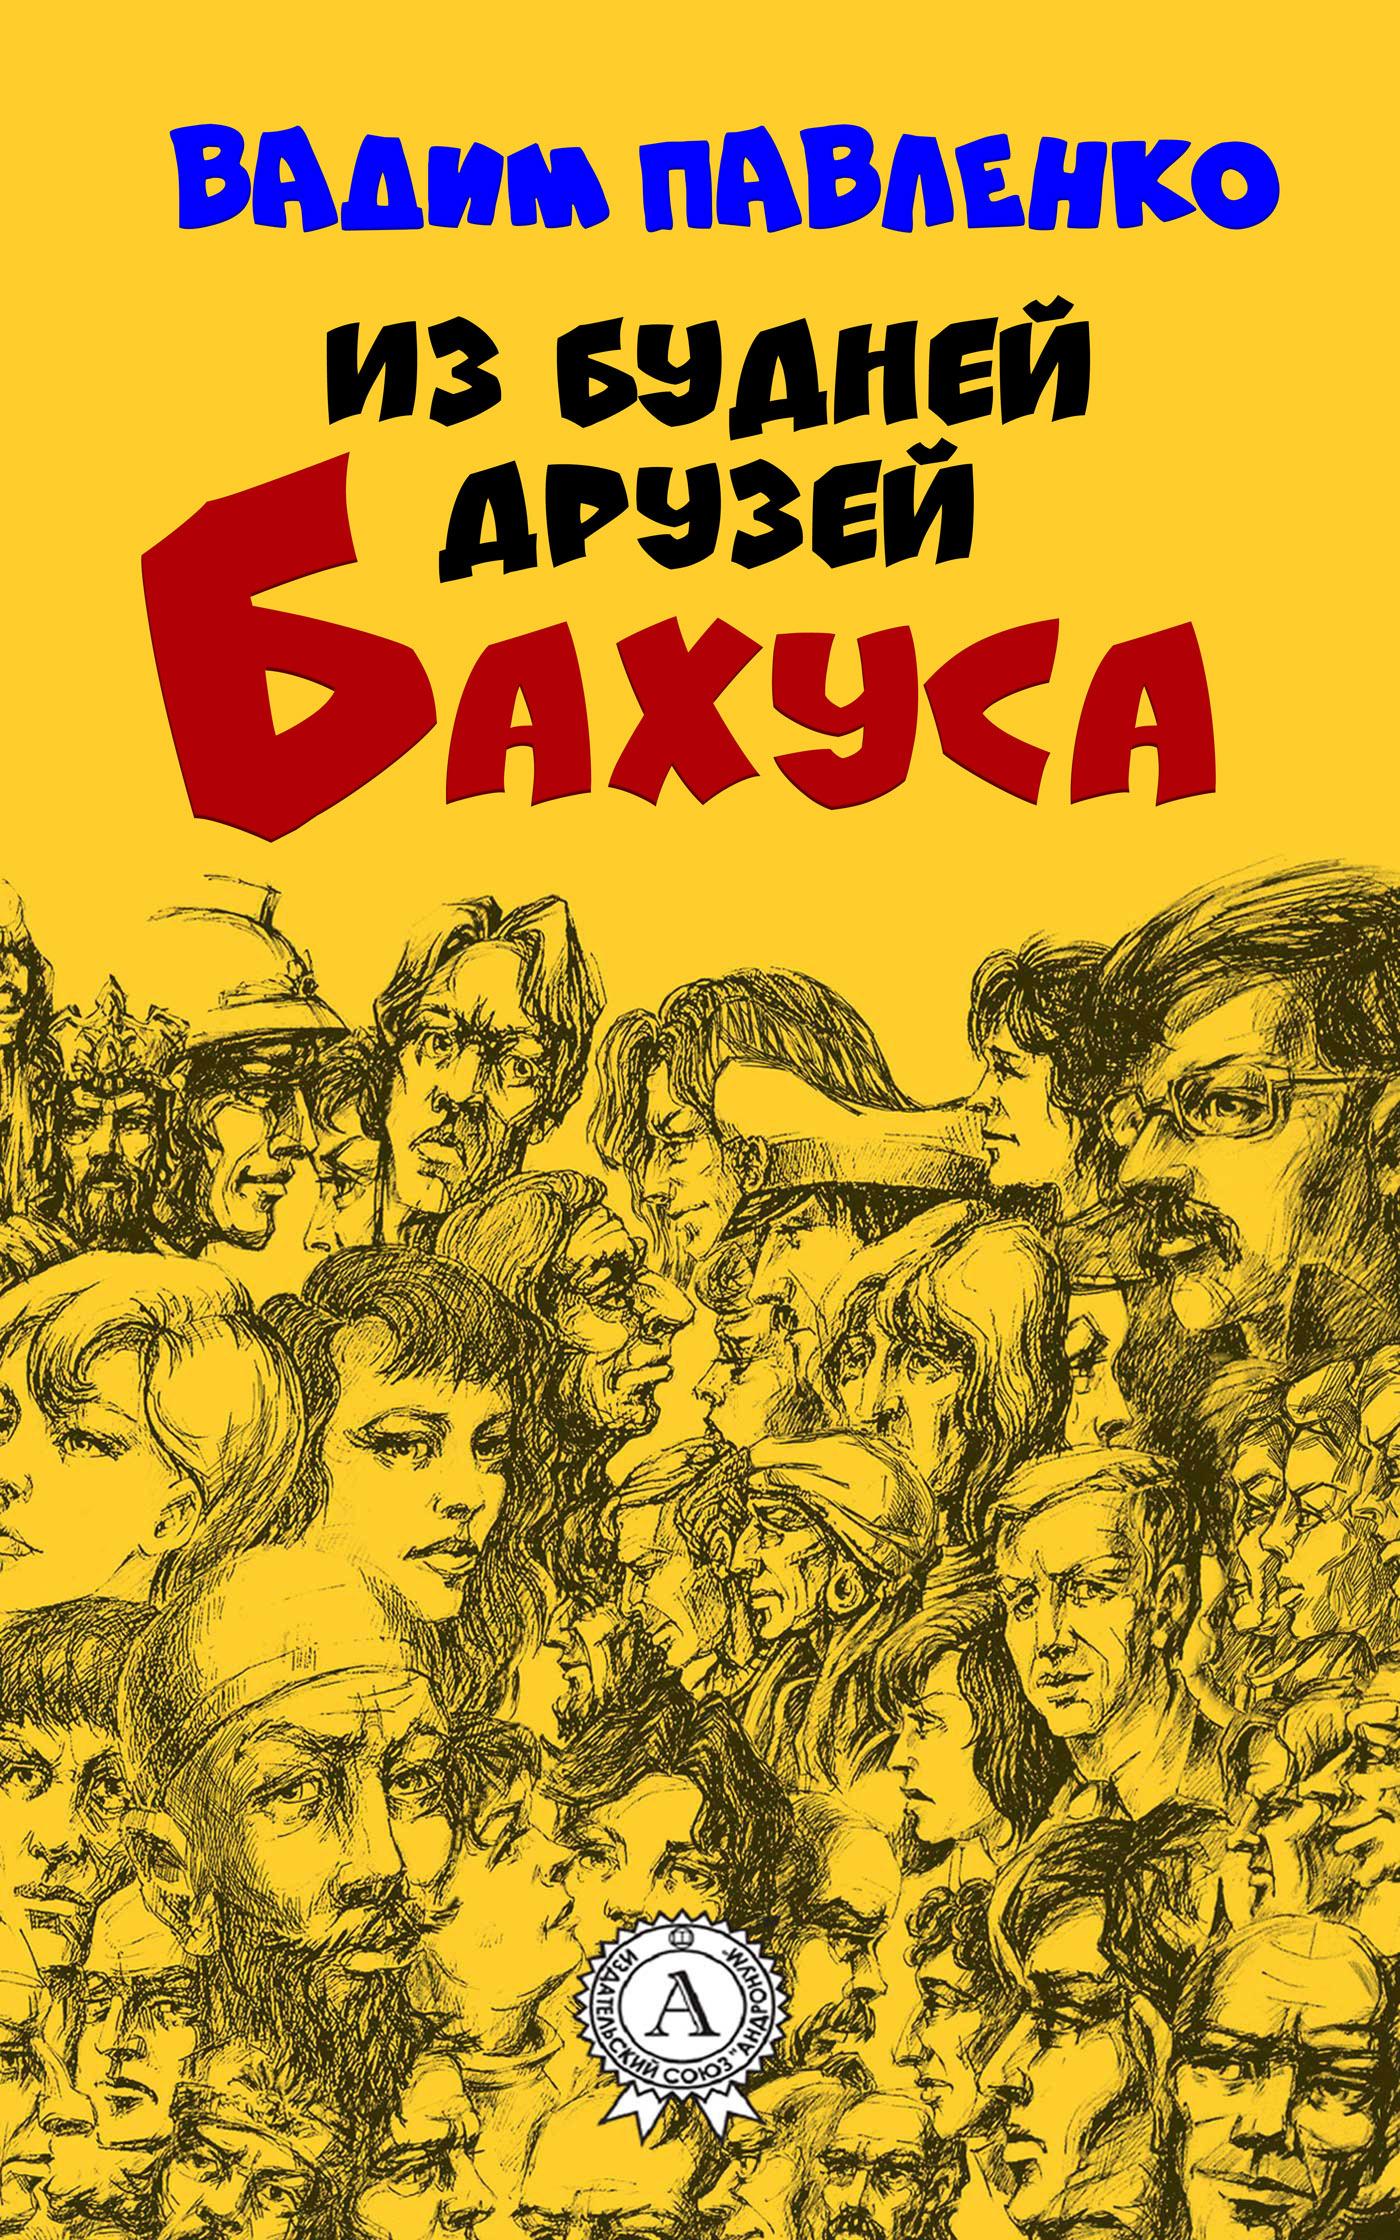 Шикарная заставка для романа 33/51/51/33515160.bin.dir/33515160.cover.jpg обложка